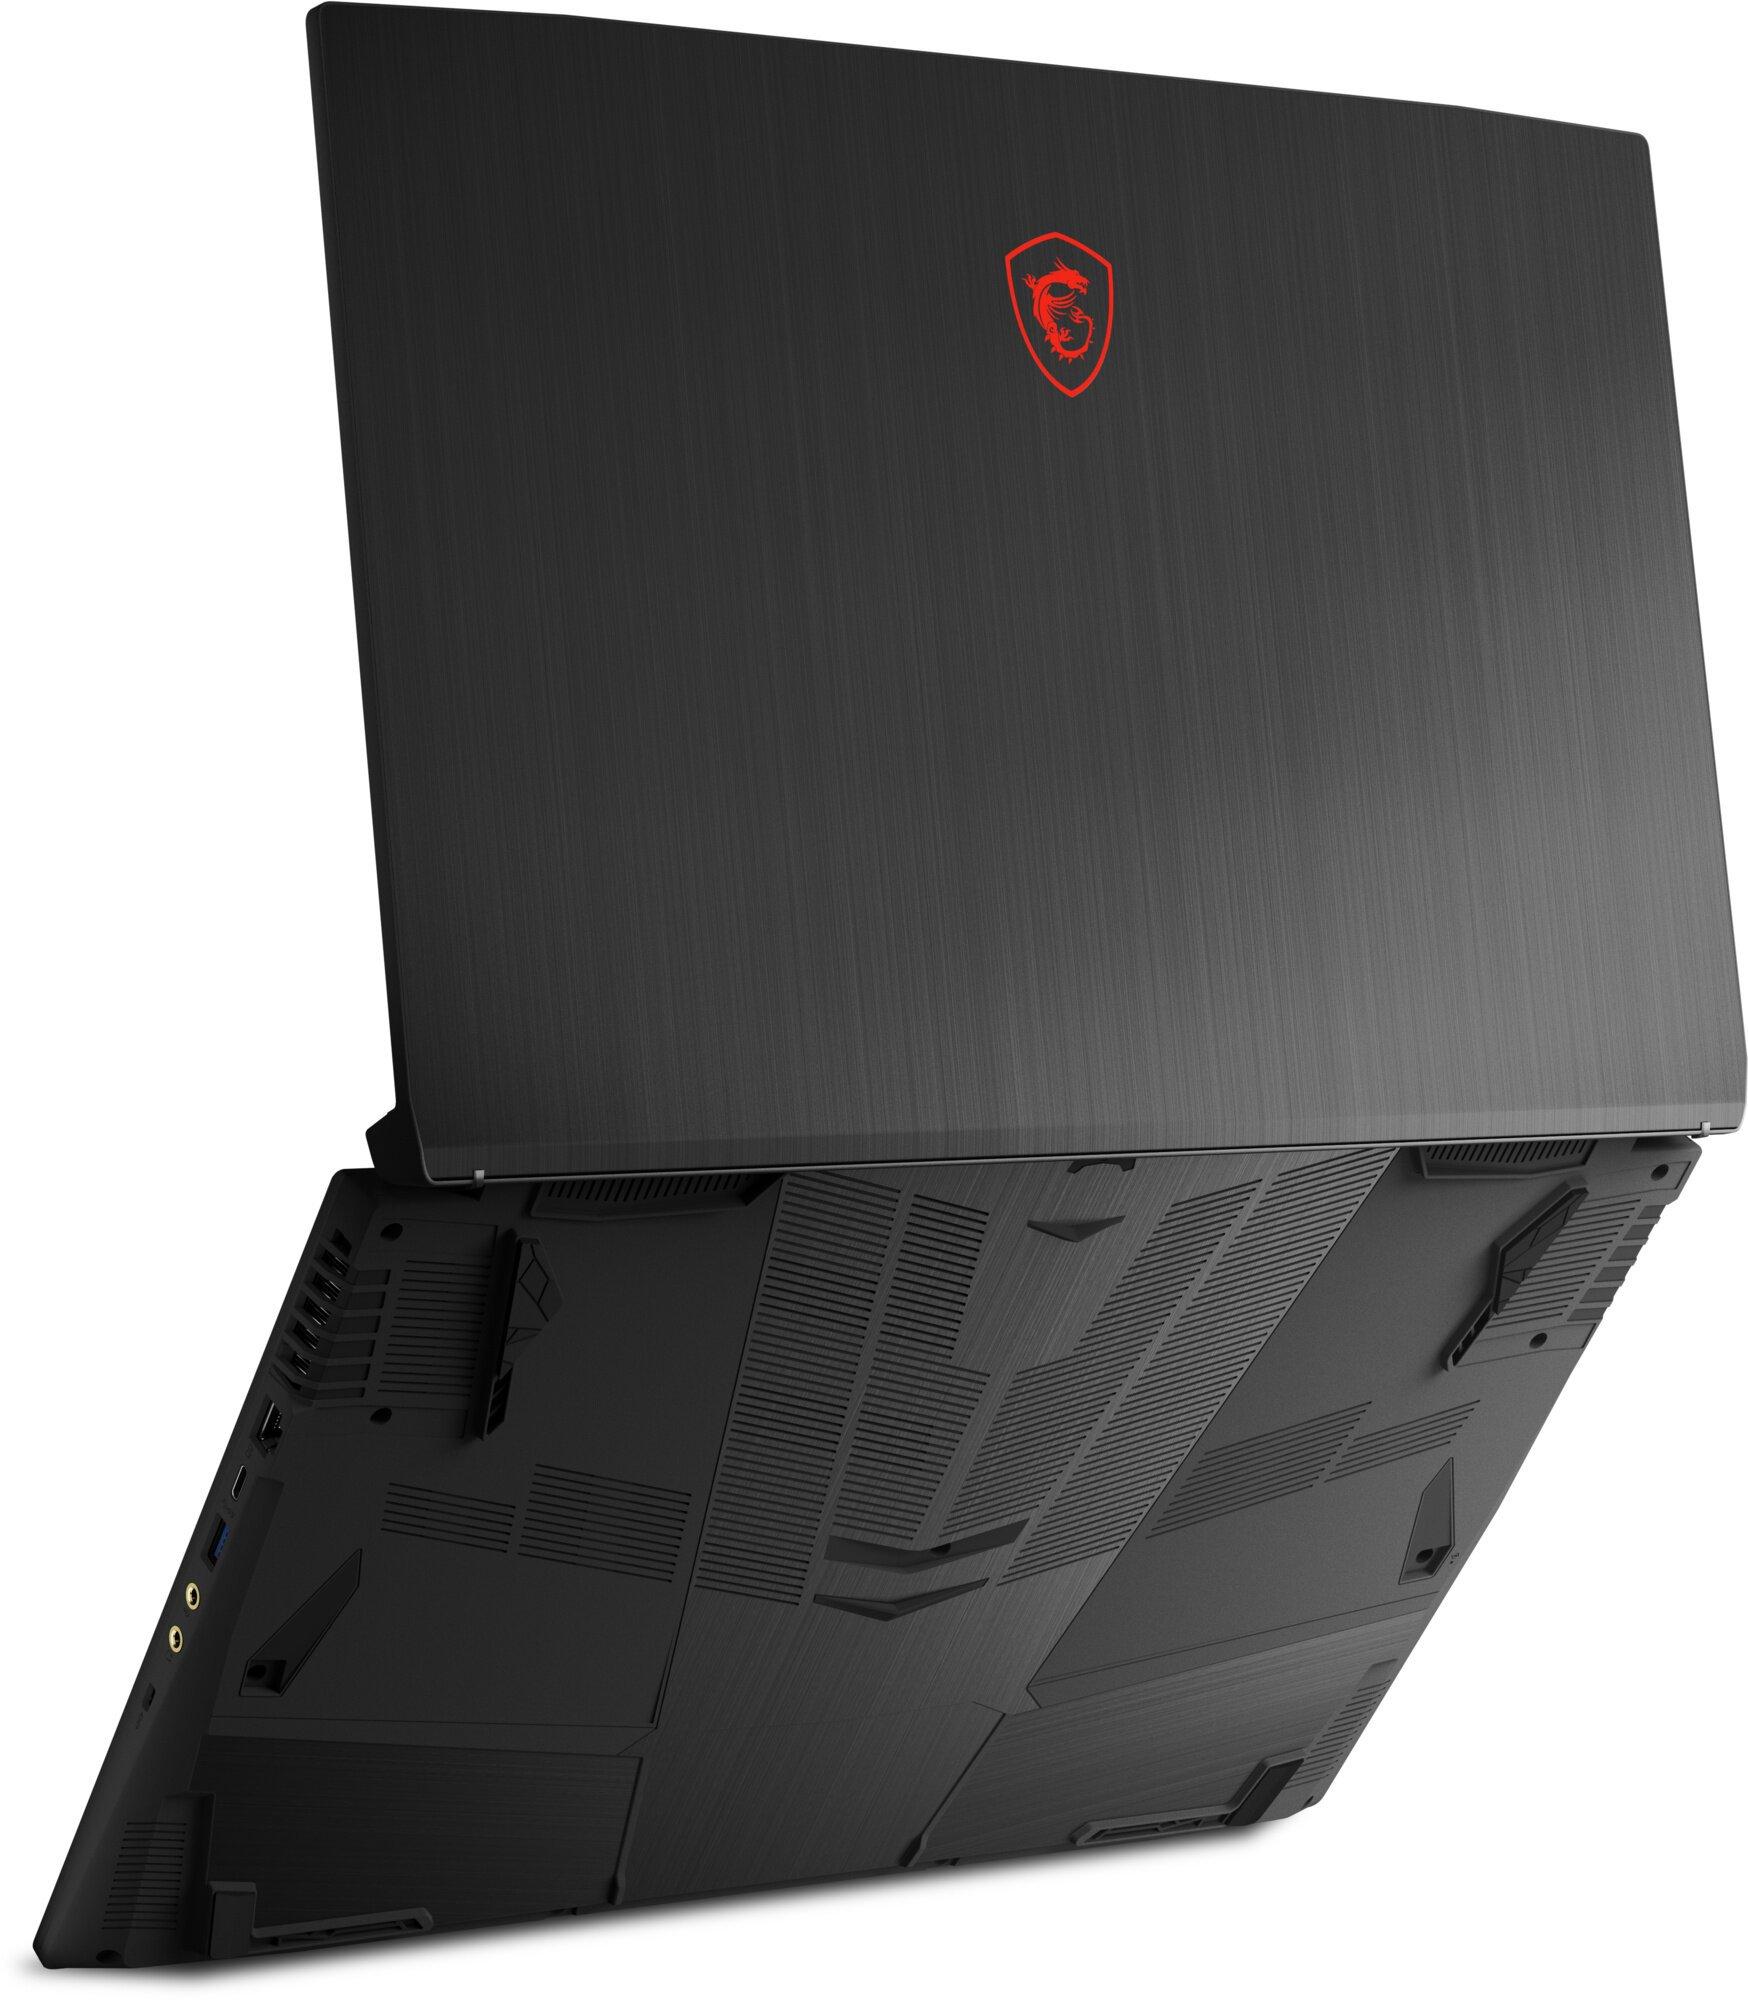 MSI GF75 Thin 10SDR-080UK